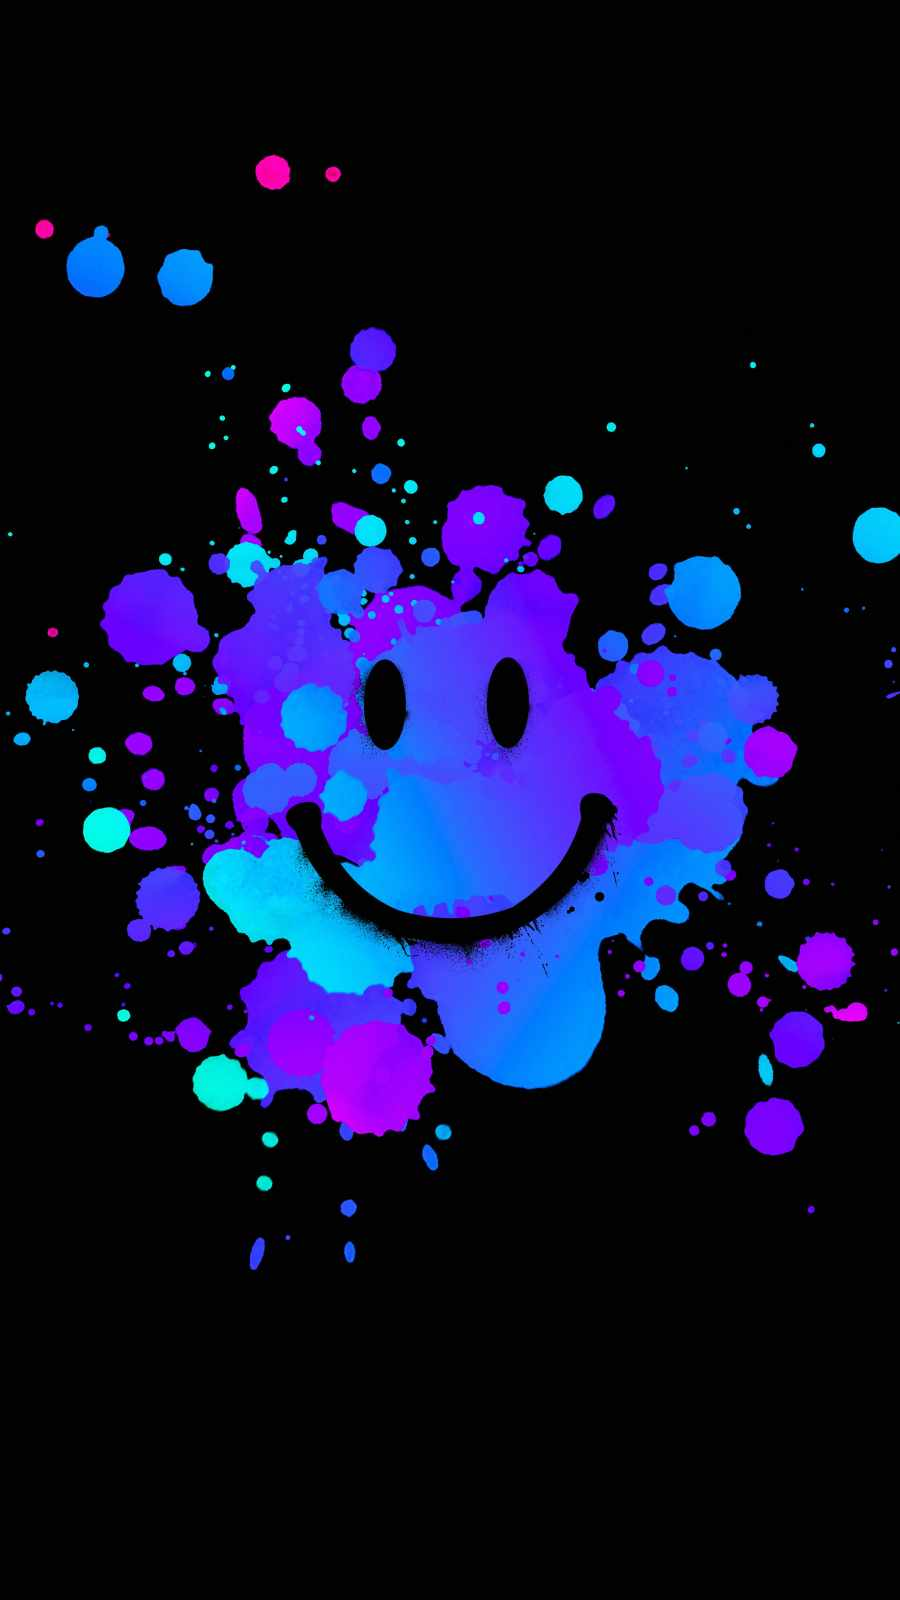 Smile Splash iPhone Wallpaper